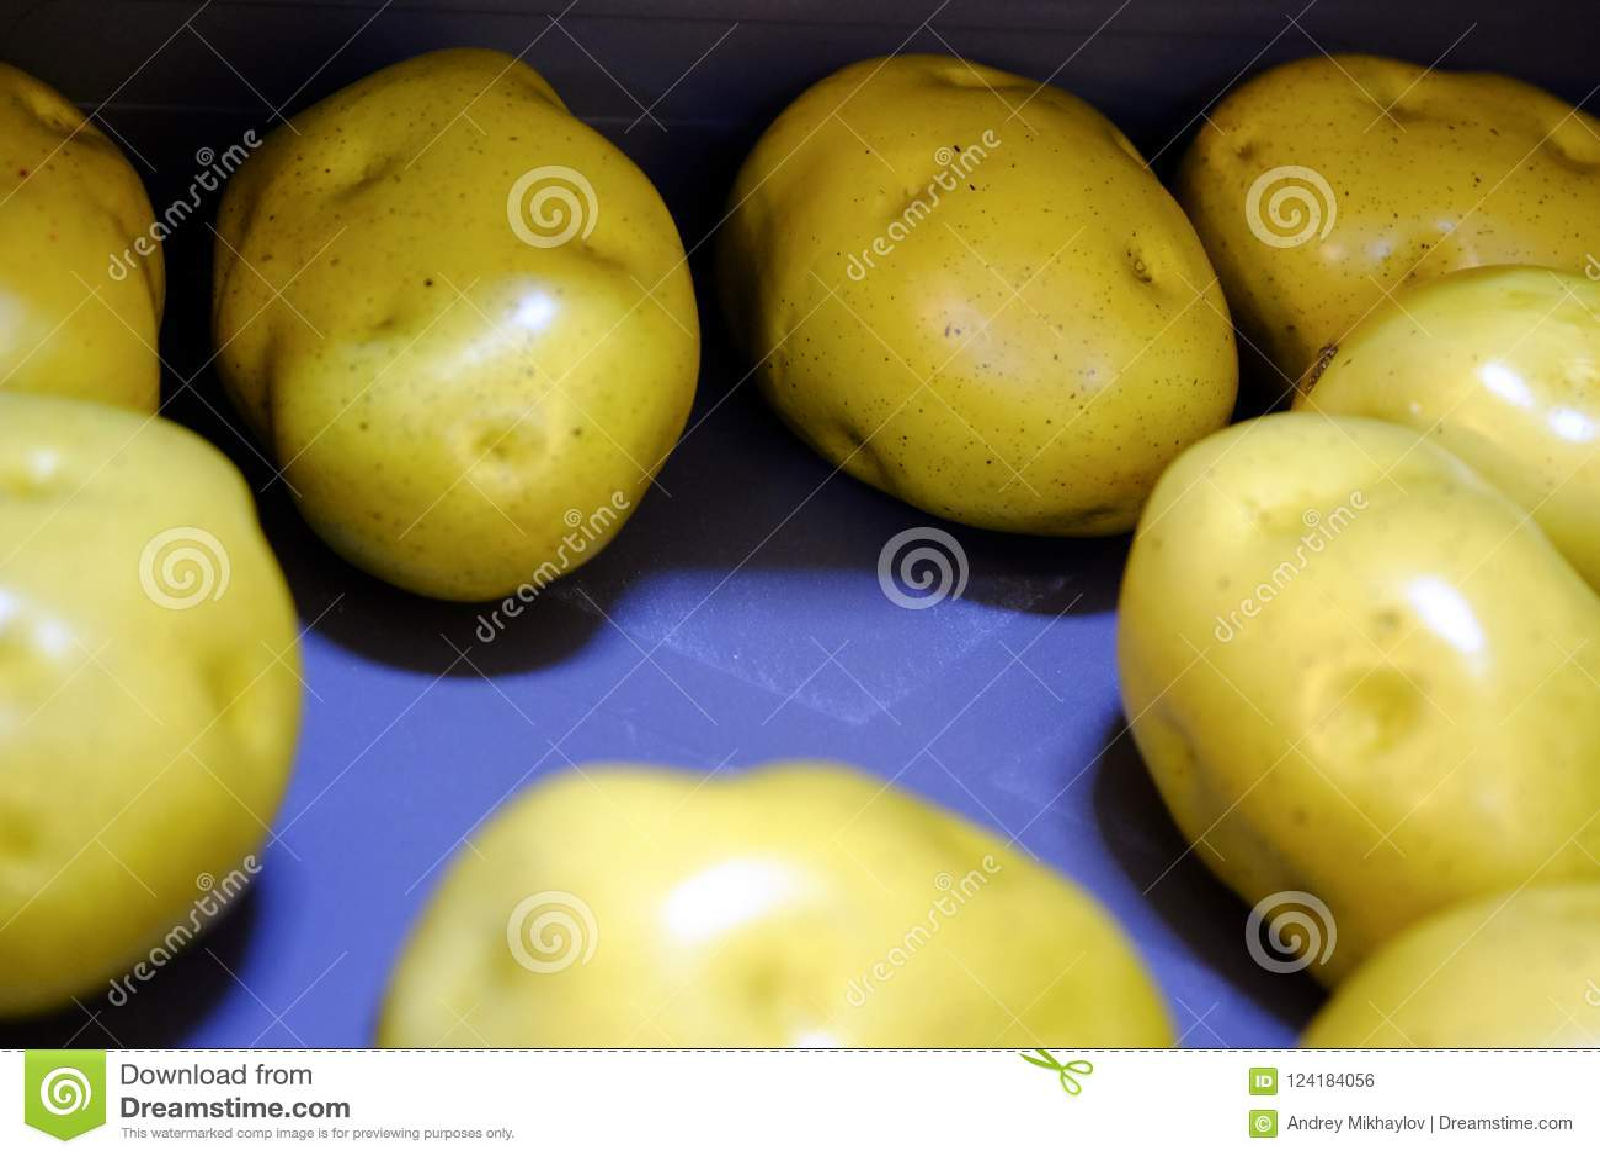 Raw potato tubers. Young washed potatoes.